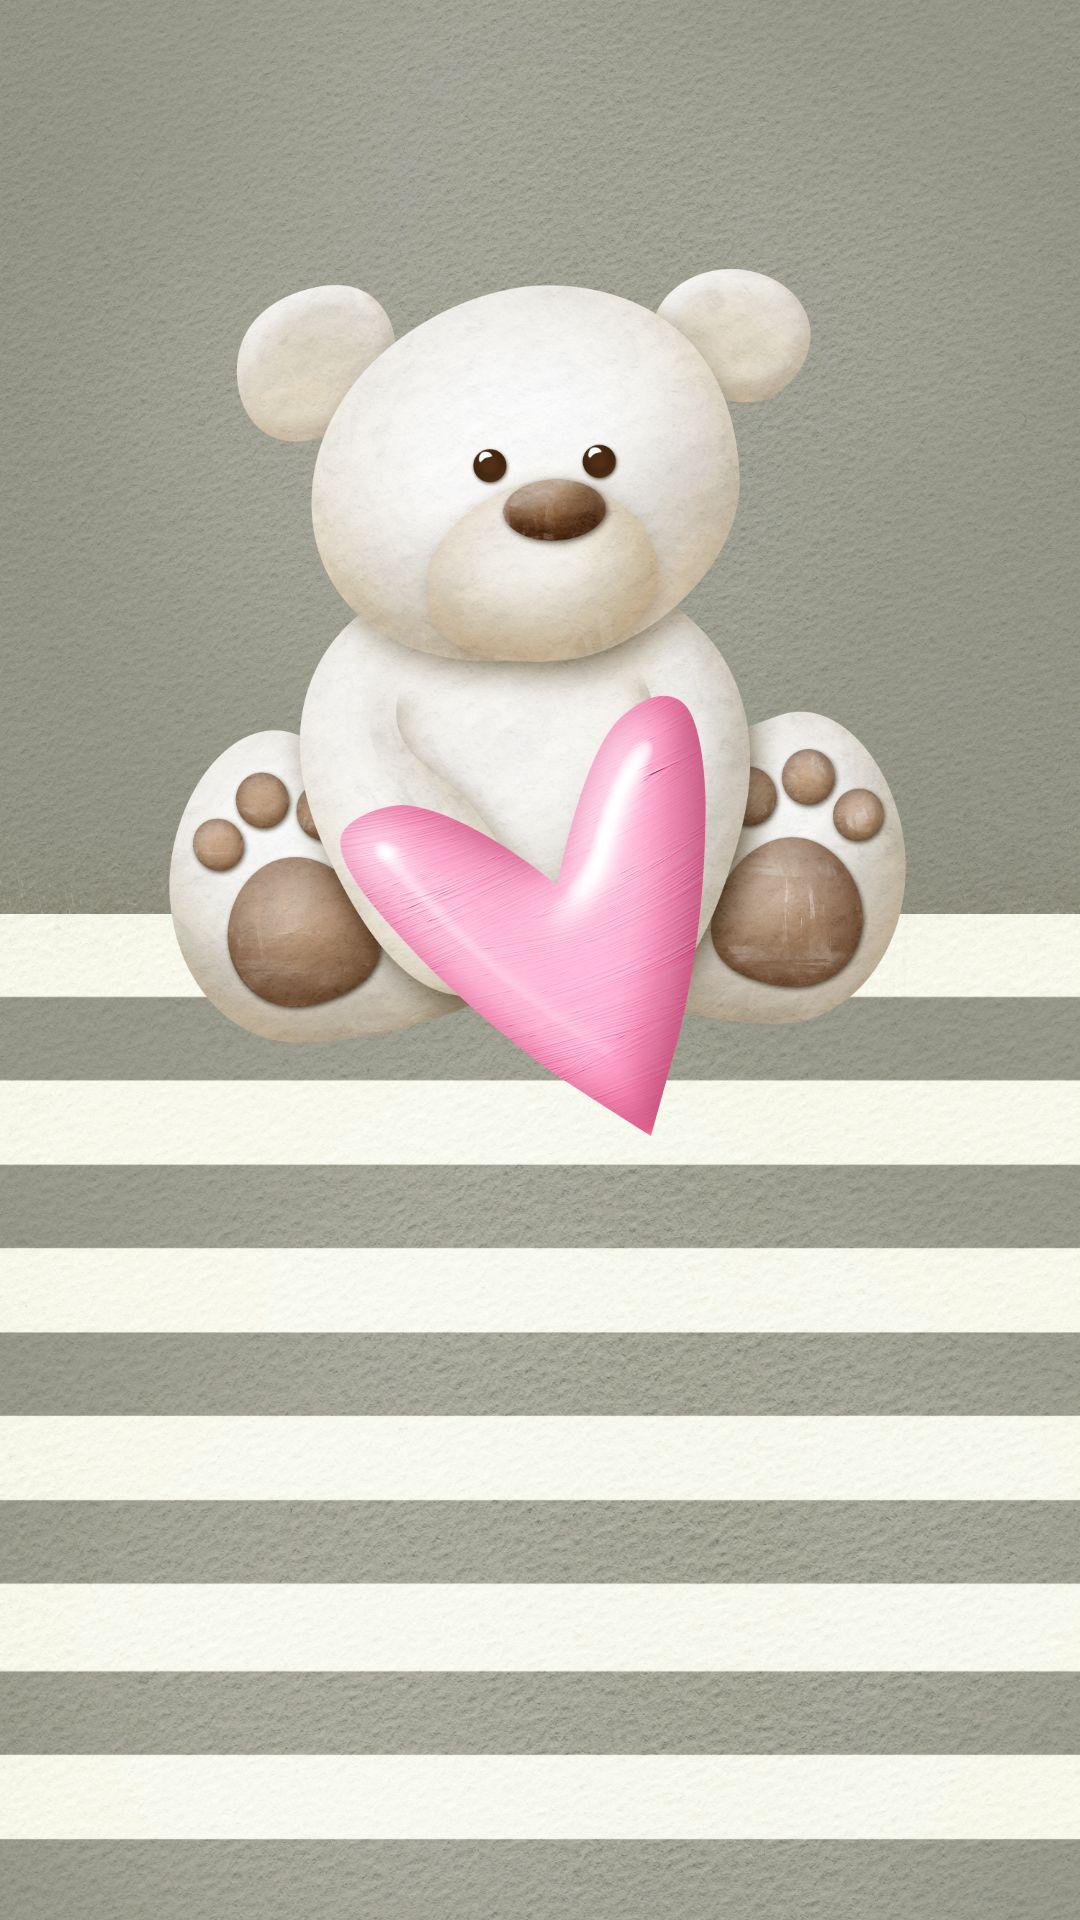 Beautiful Wallpaper Mobile Teddy Bear - 8f560d37902d45ee76ca50cf50342480  You Should Have_51875.jpg